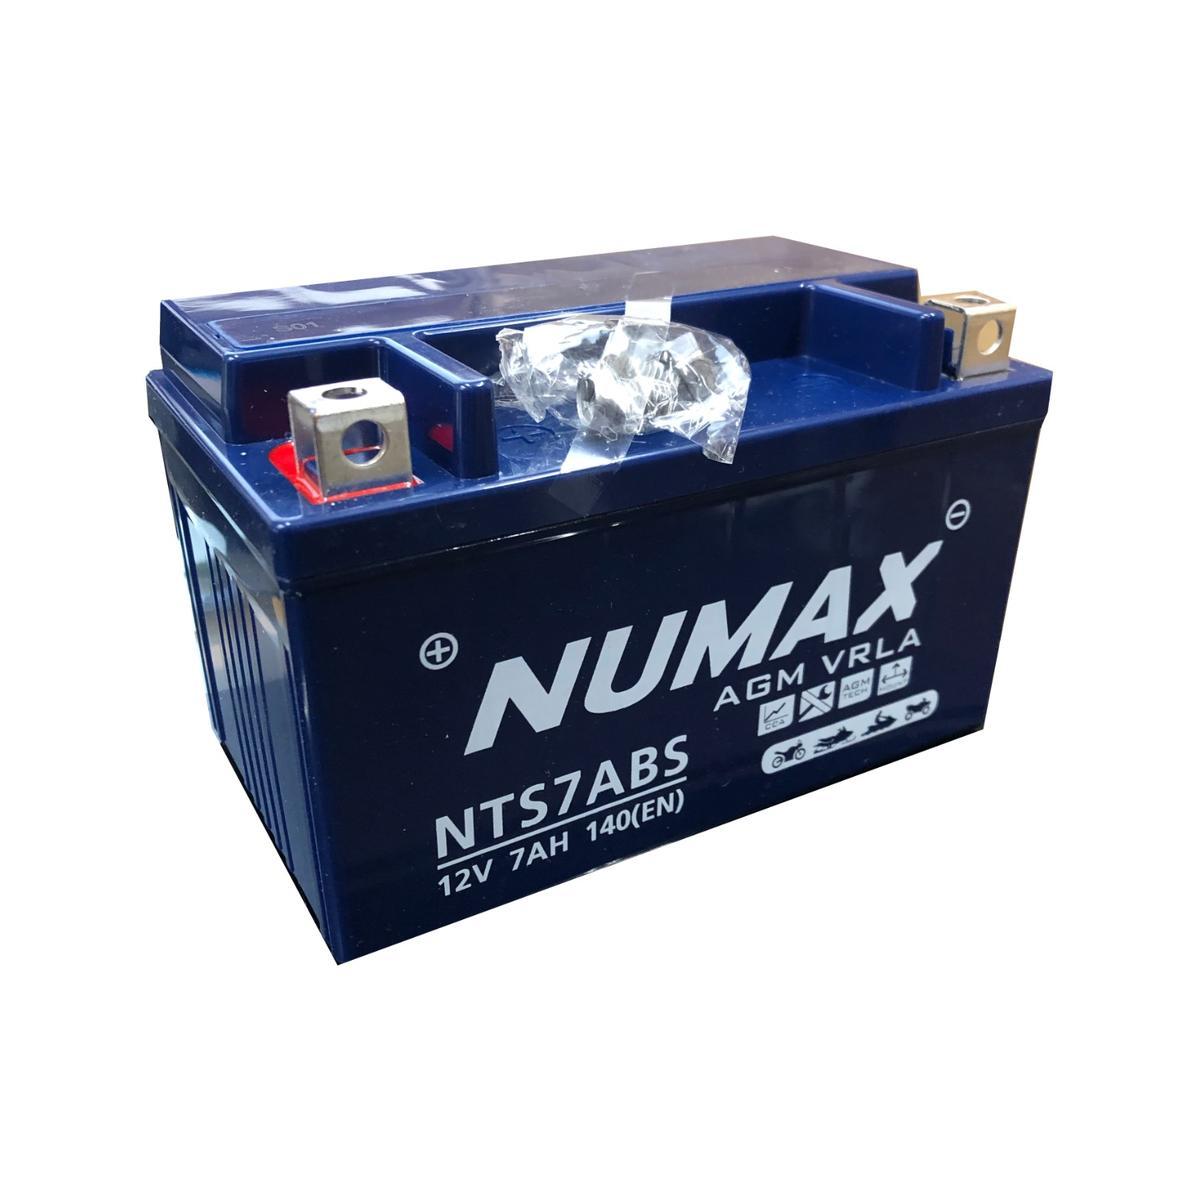 Numax NTS7ABS 12v Motorbike Bike Battery SUZUKI 250cc AN250 YTX7A-4